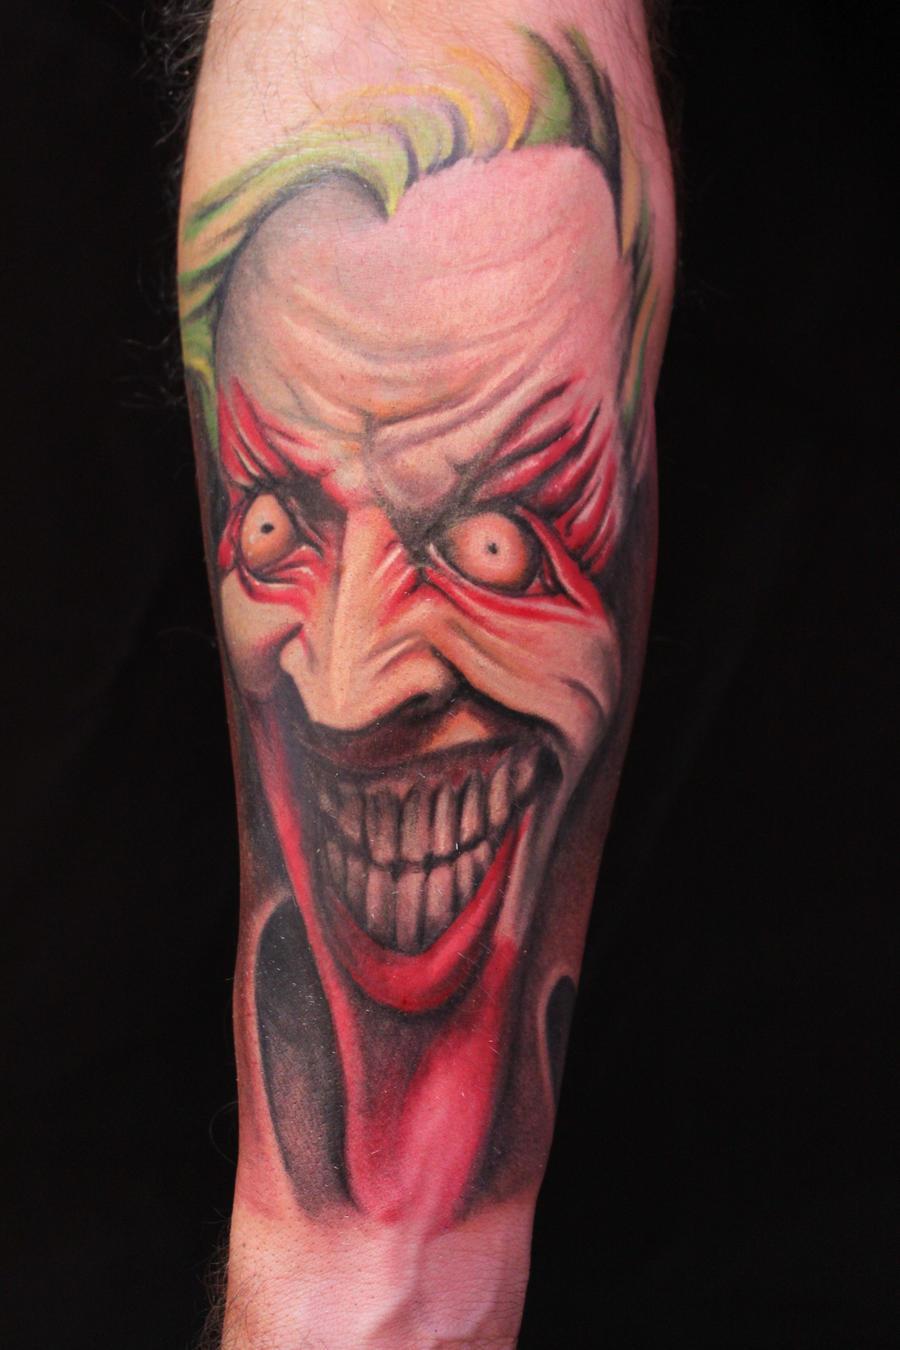 Batman joker tattoo by ianik13 on deviantart for Joker batman tattoo